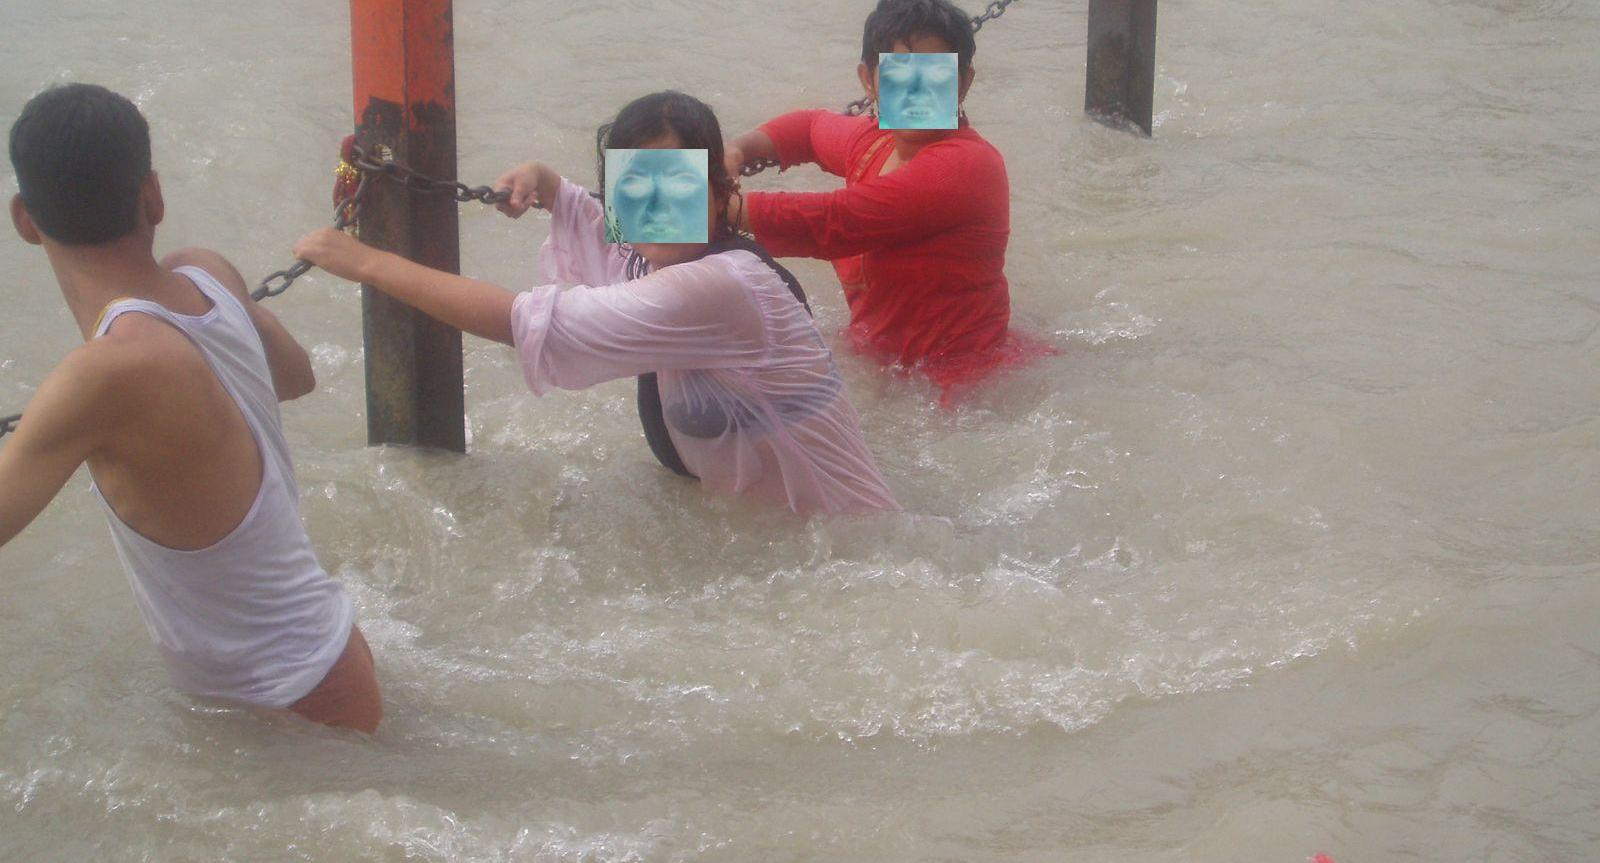 Indian Girls Bathing In River Nipple Visible - Chuttiyappa-2020